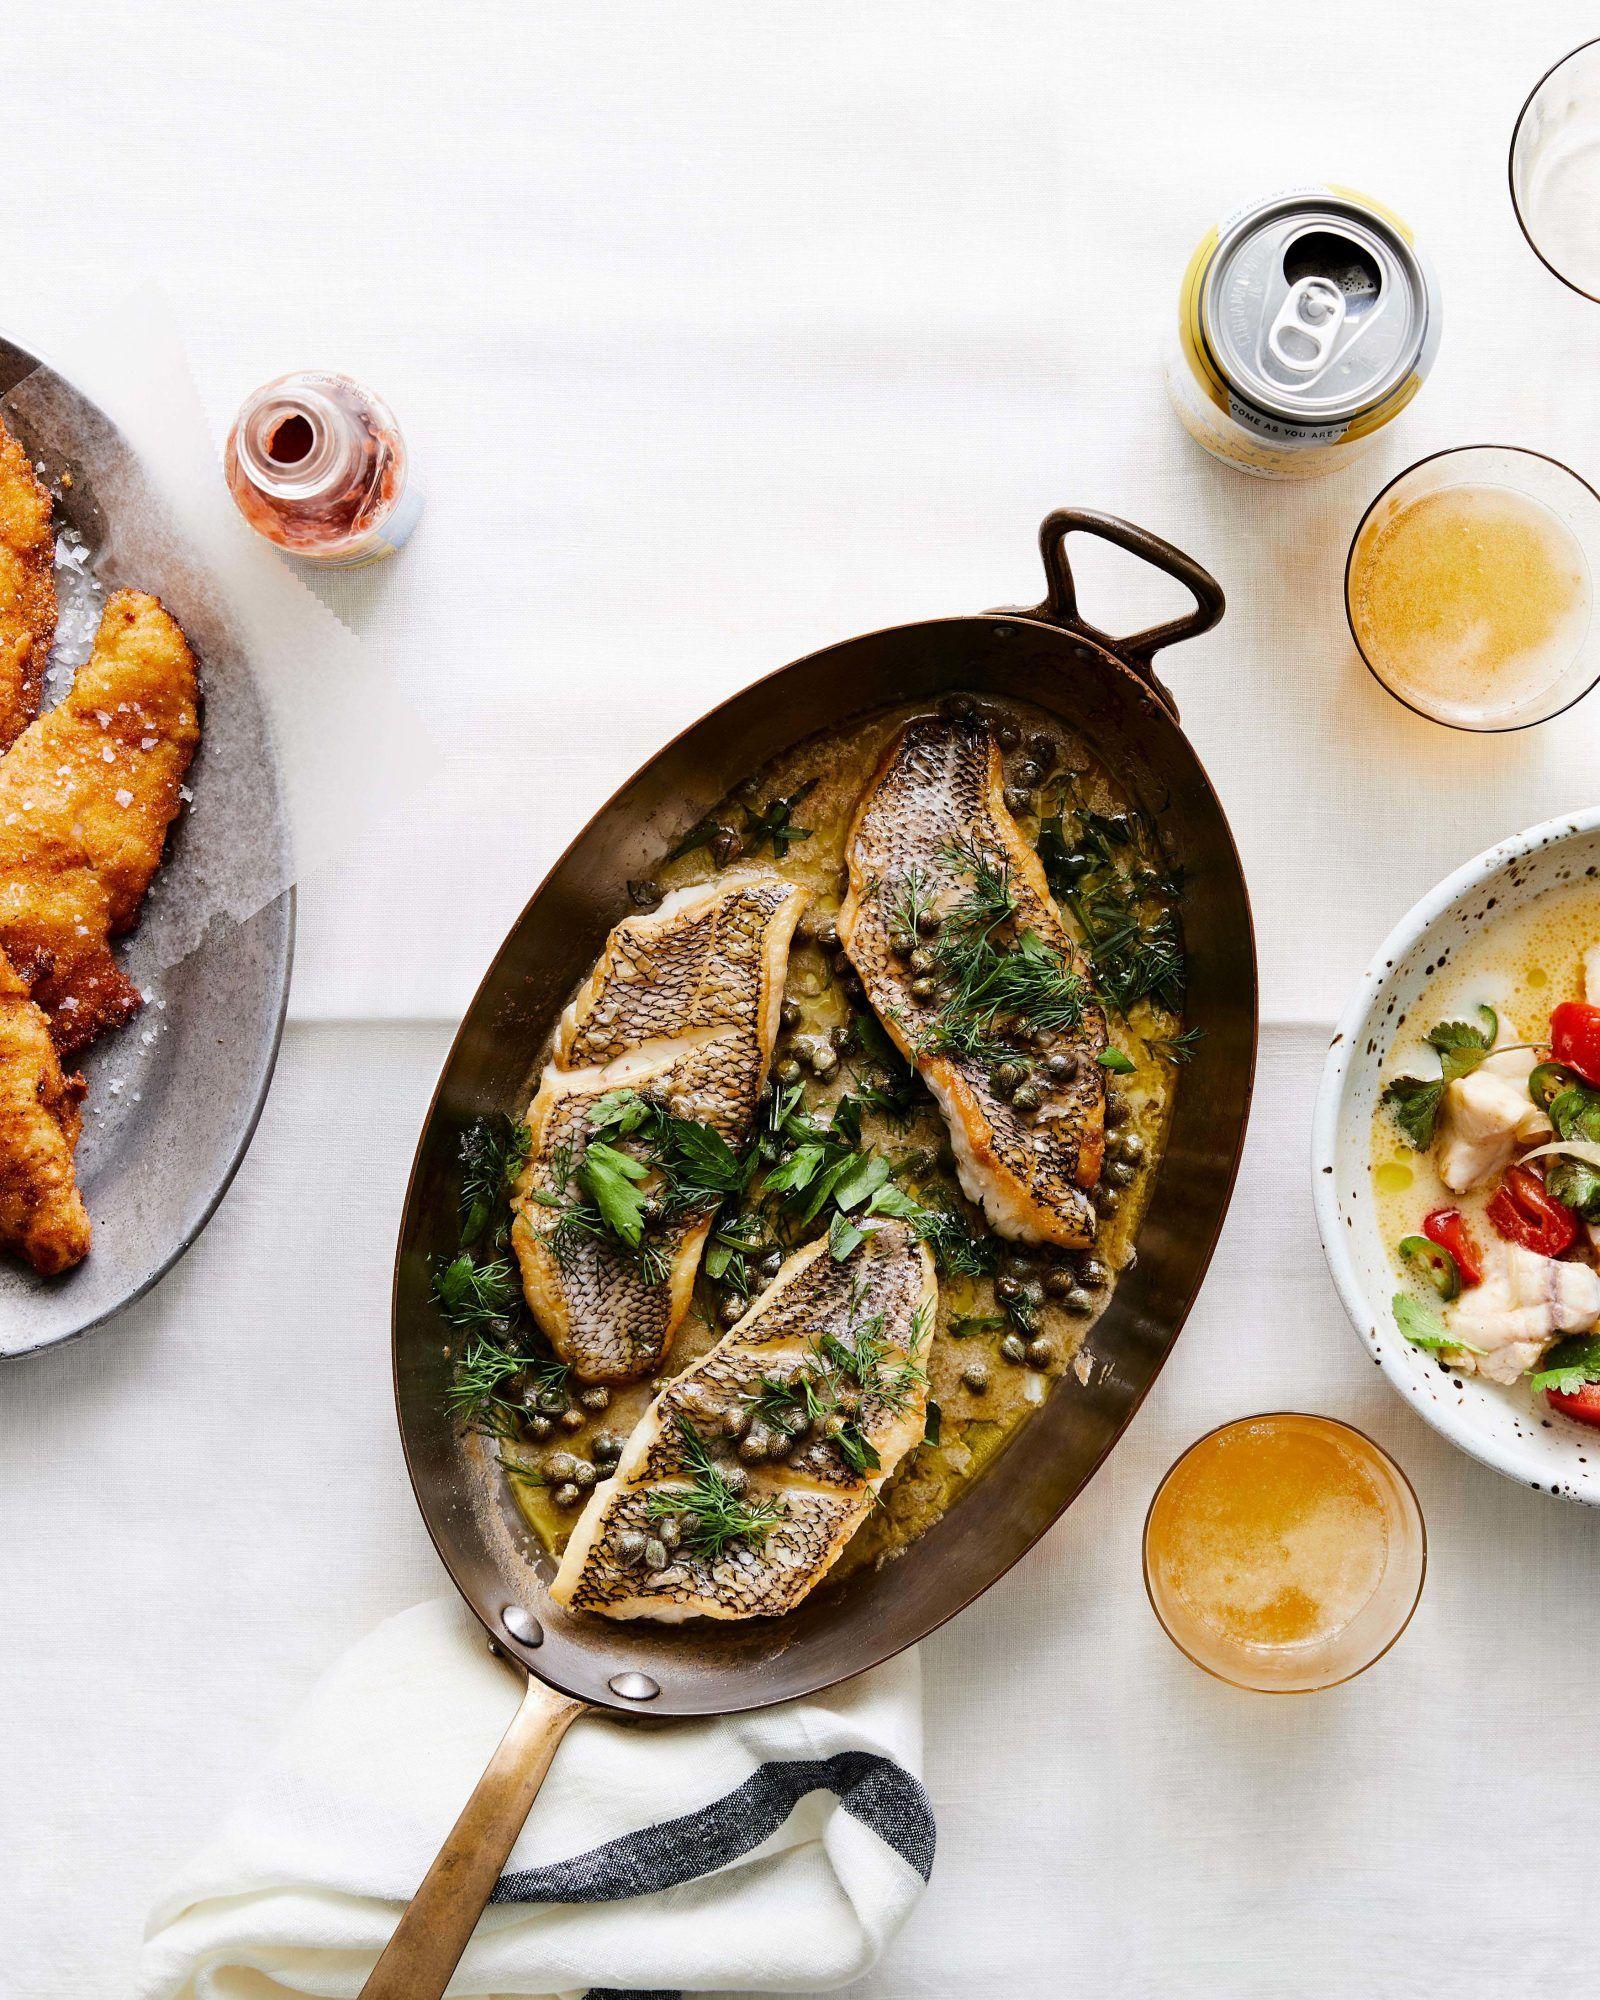 Pin On Meats Fish Seafood Shellfish